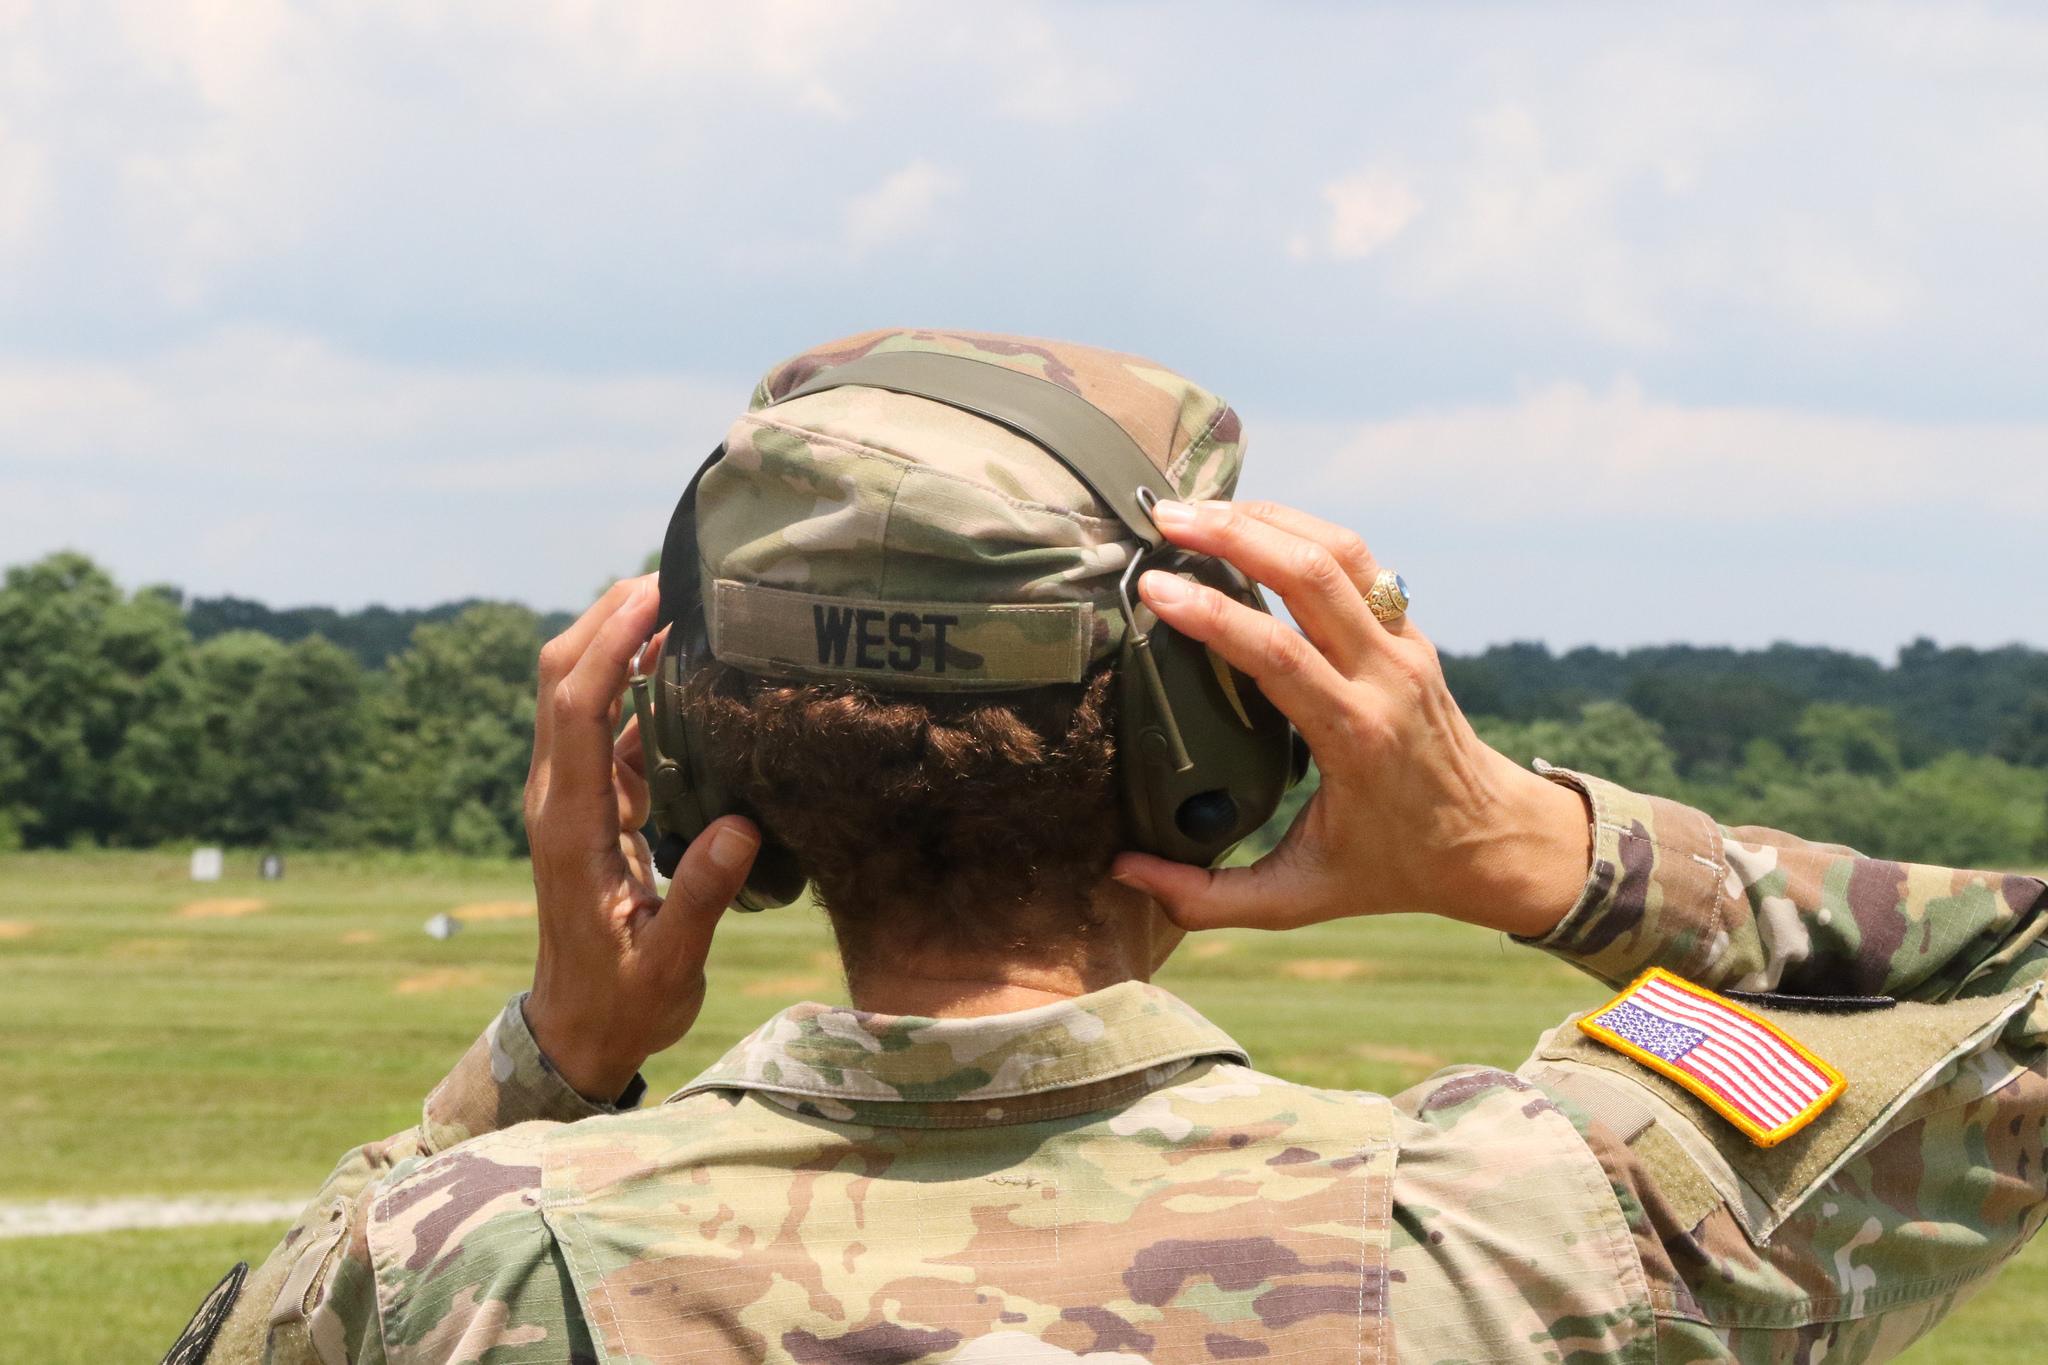 Lt. Gen. Nadja Y. West visits CST